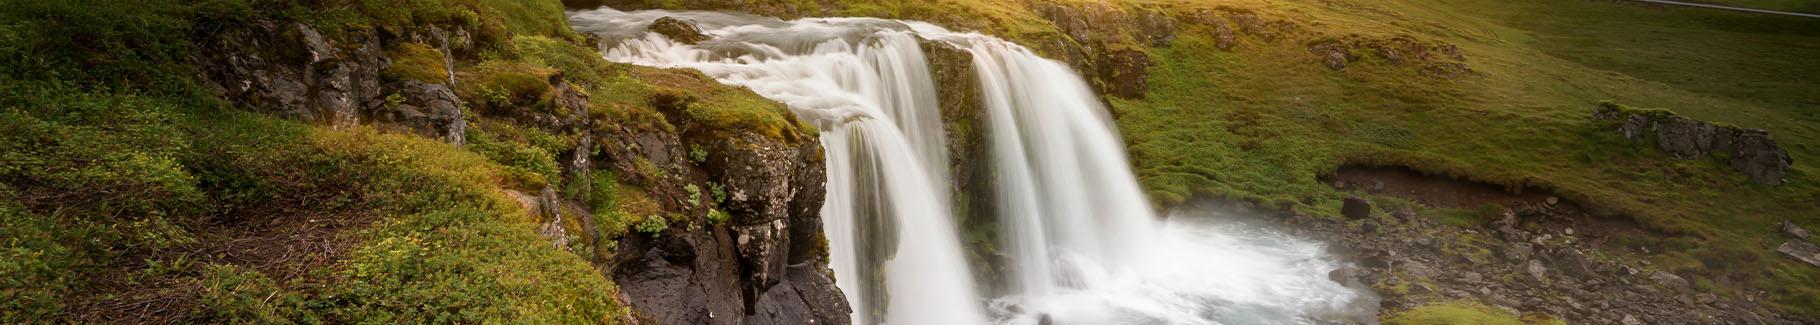 Fototapeta wodospad na Islandii